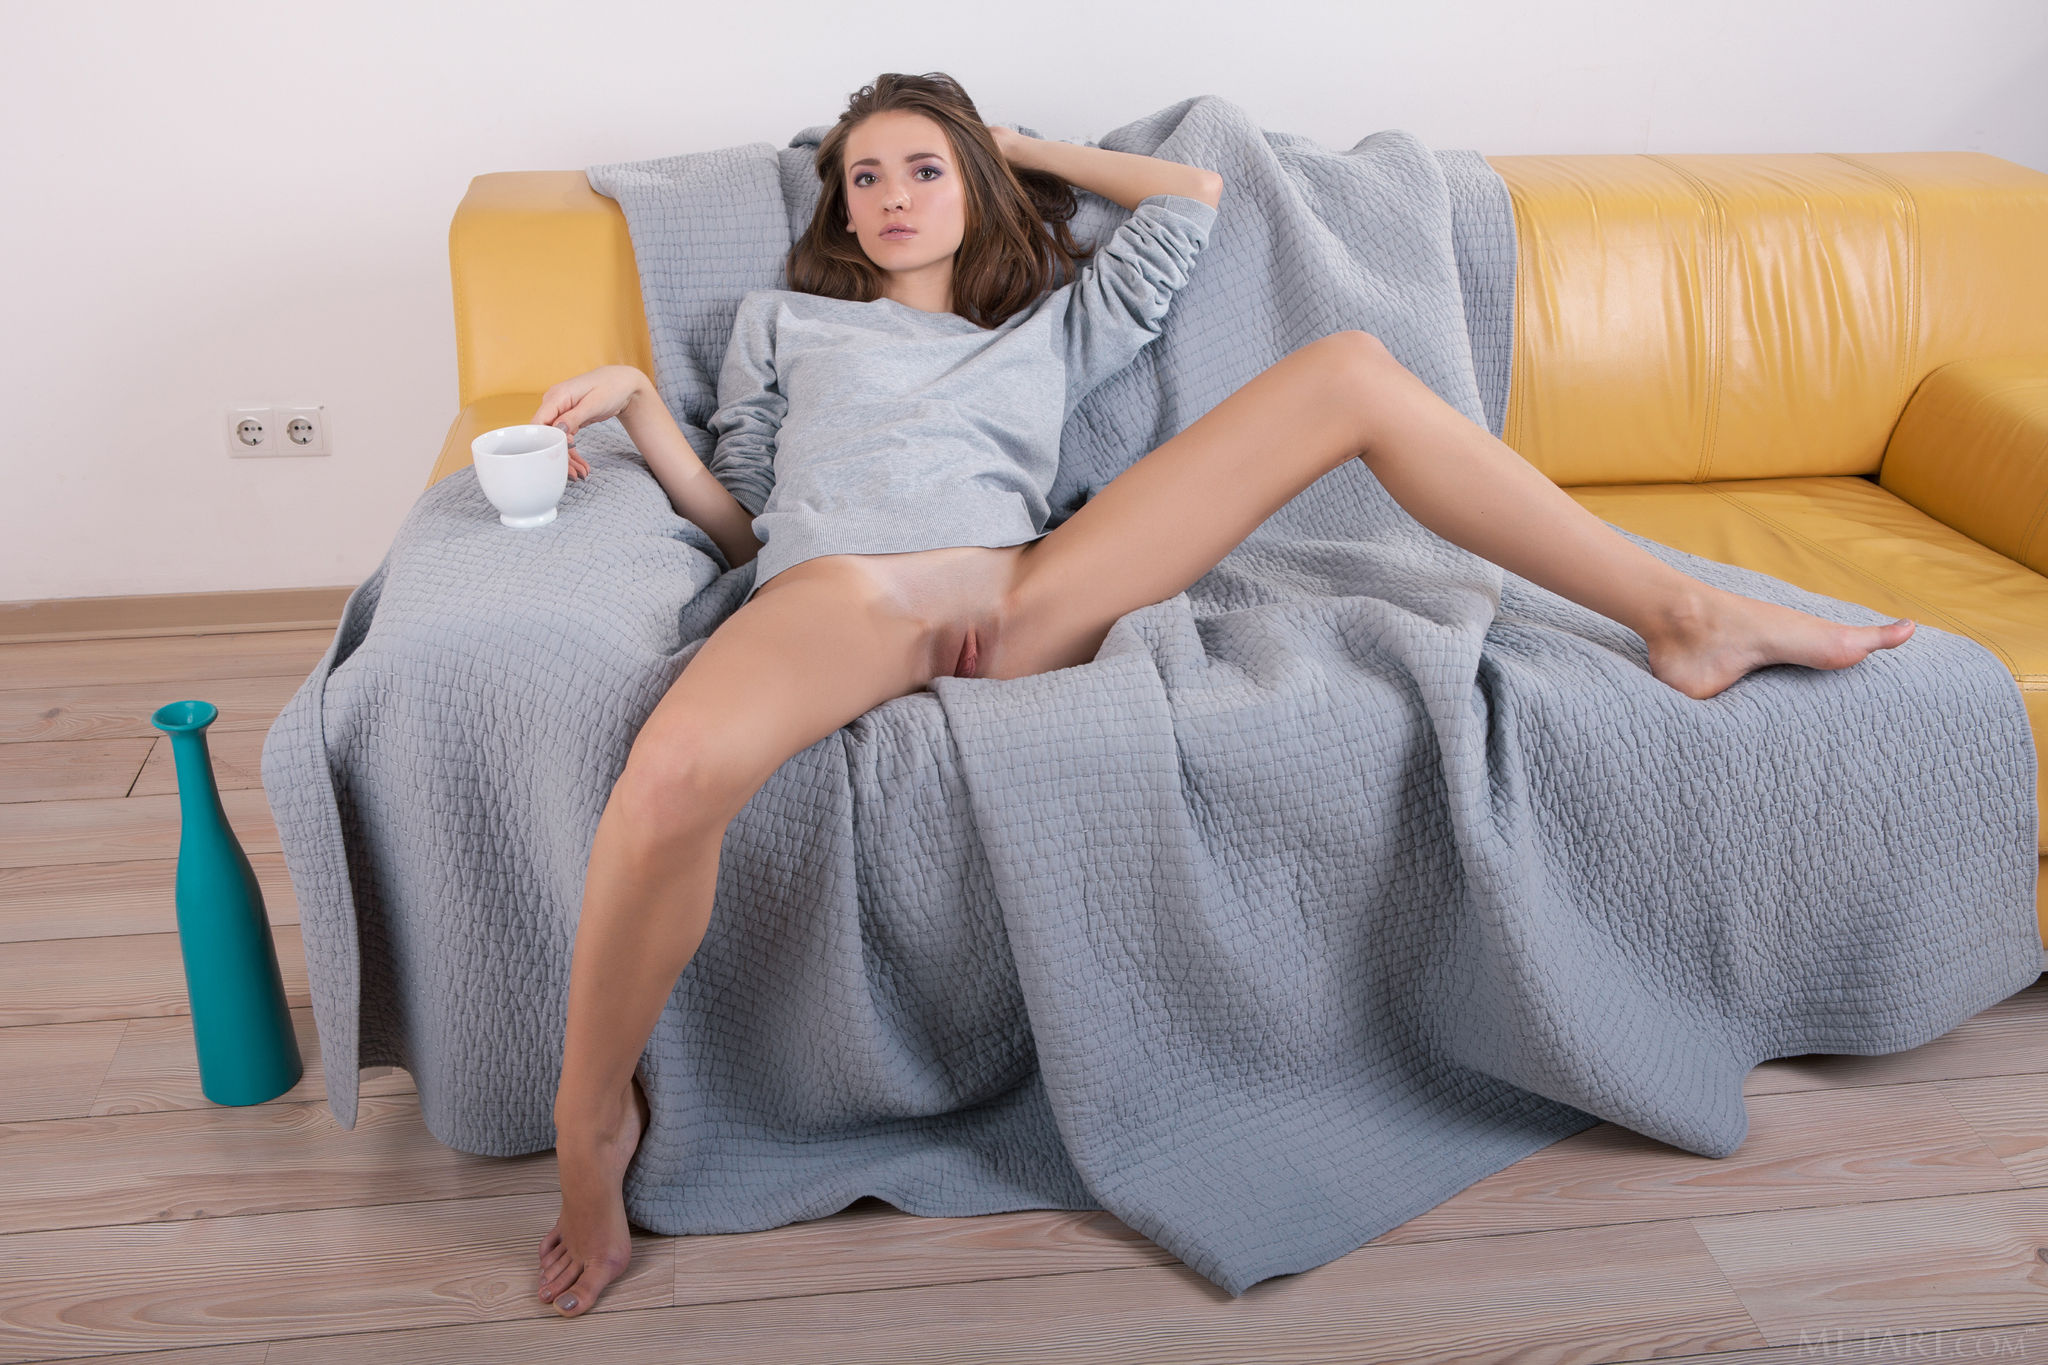 bottomless-girls-nude-mix-42